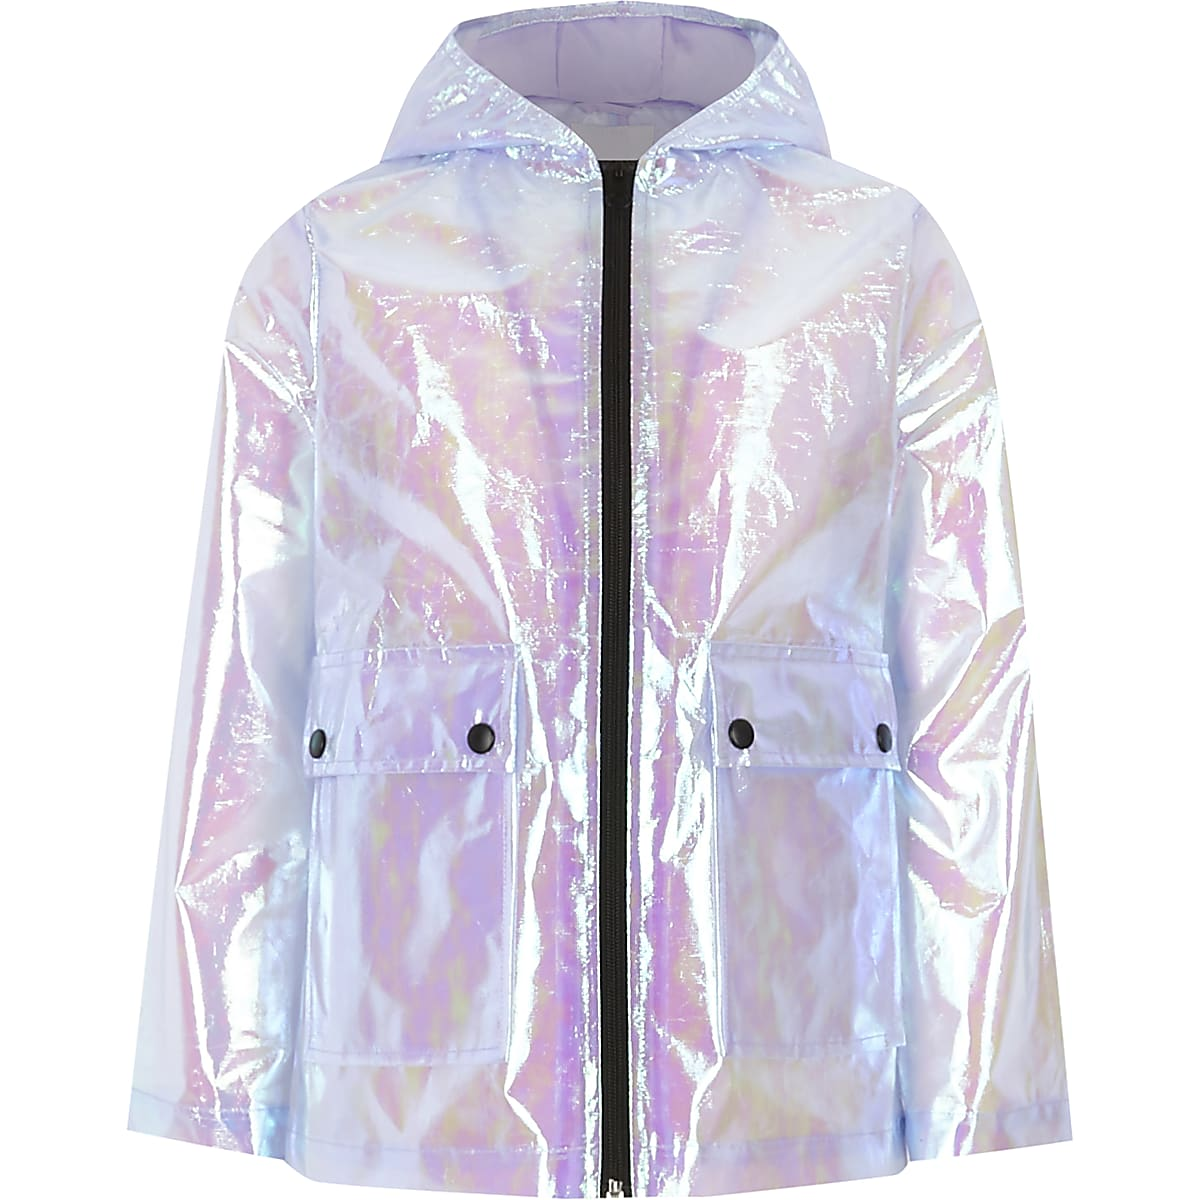 3b75ad242ad5 Girls purple iridescent rain mac - Jackets - Coats   Jackets - girls